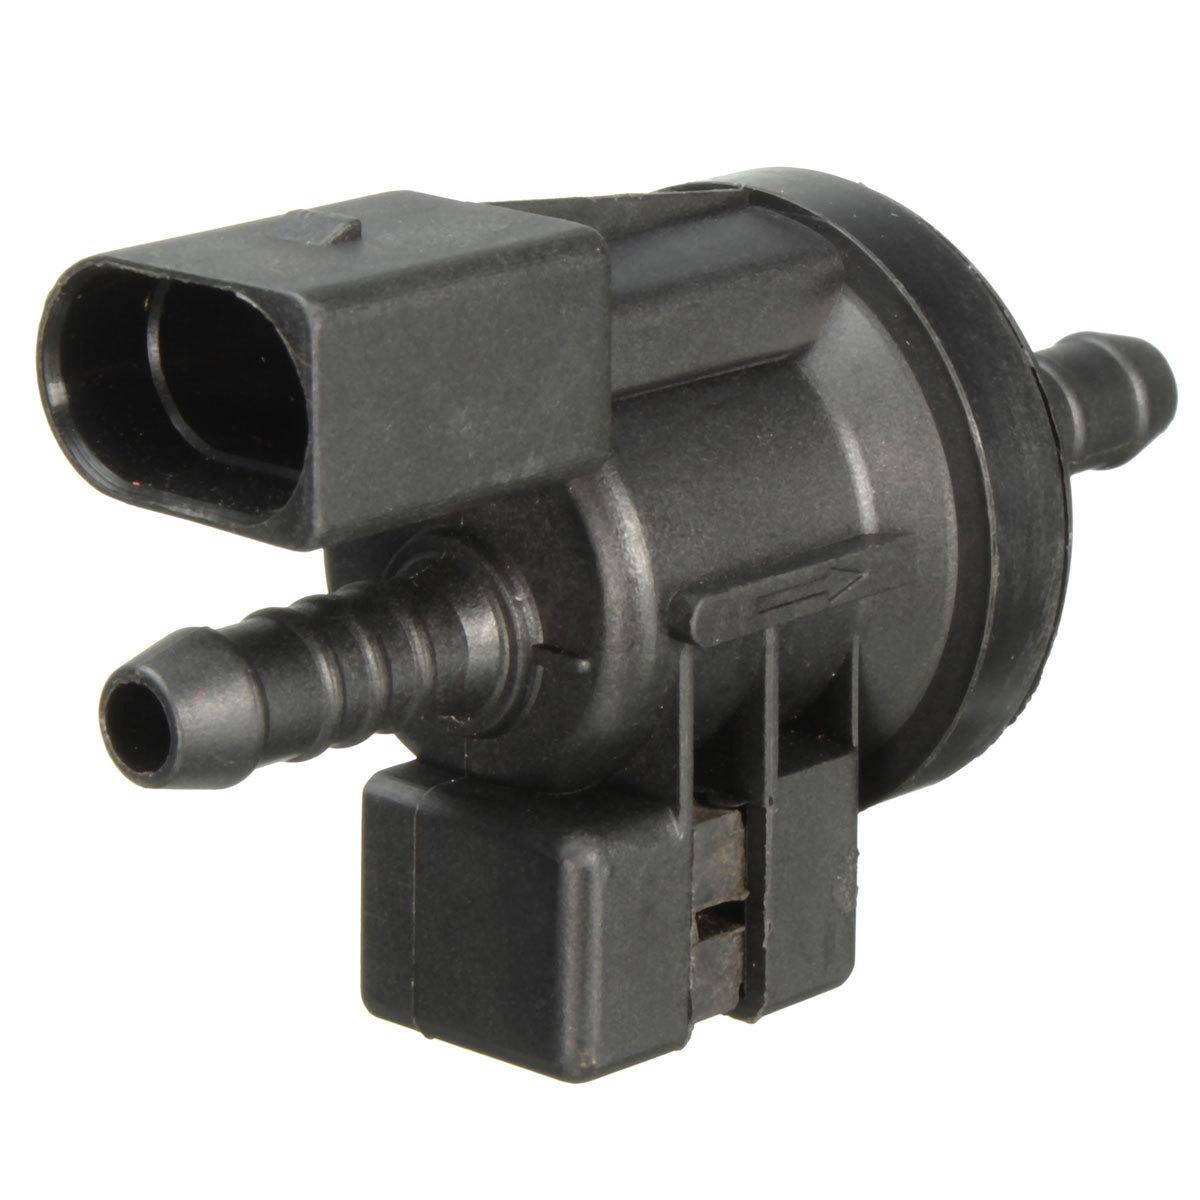 Canister Purge Valve Solenoid >> Fuel Vapor Canister Purge Solenoid Valve For Audi A3 A4 A6